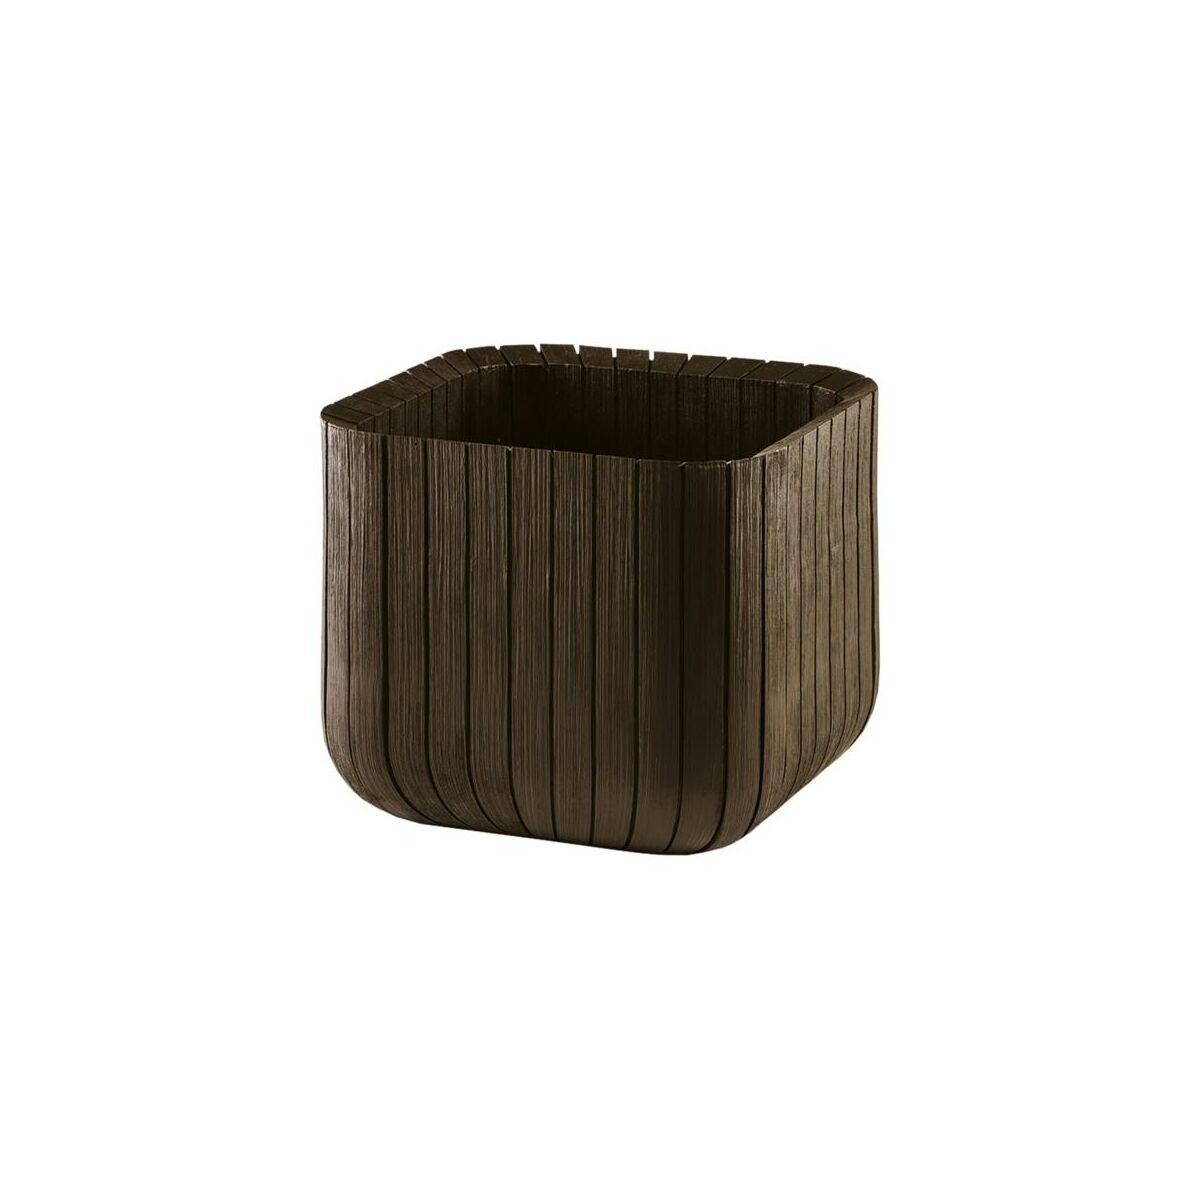 Doniczka Cube S 297 X 297 Cm Keter